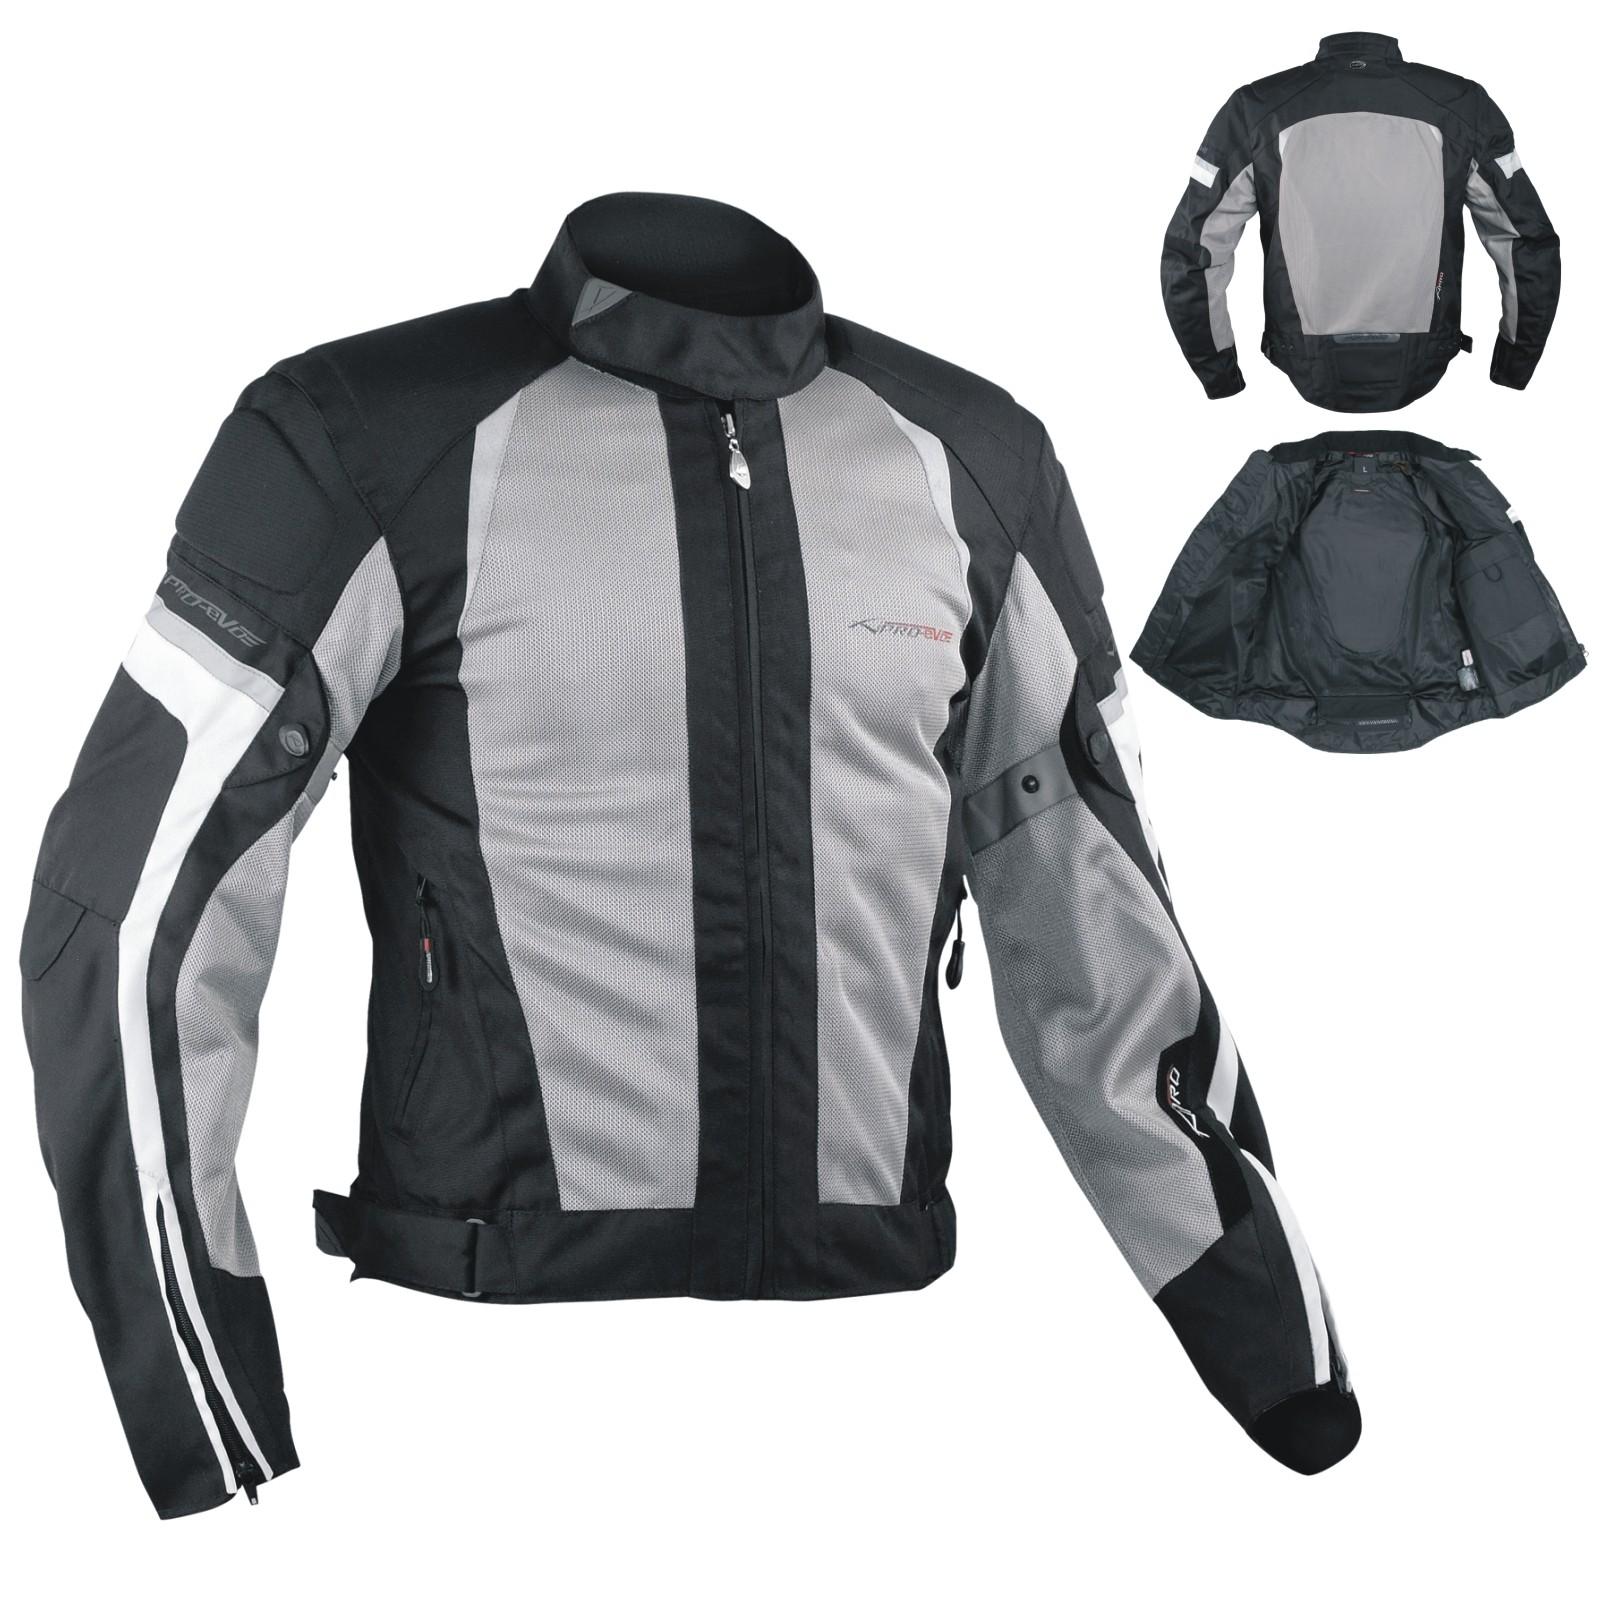 c10a3704677 eolo giacca moto mesh jacket motorcycle a-pro grey grigio set.jpg